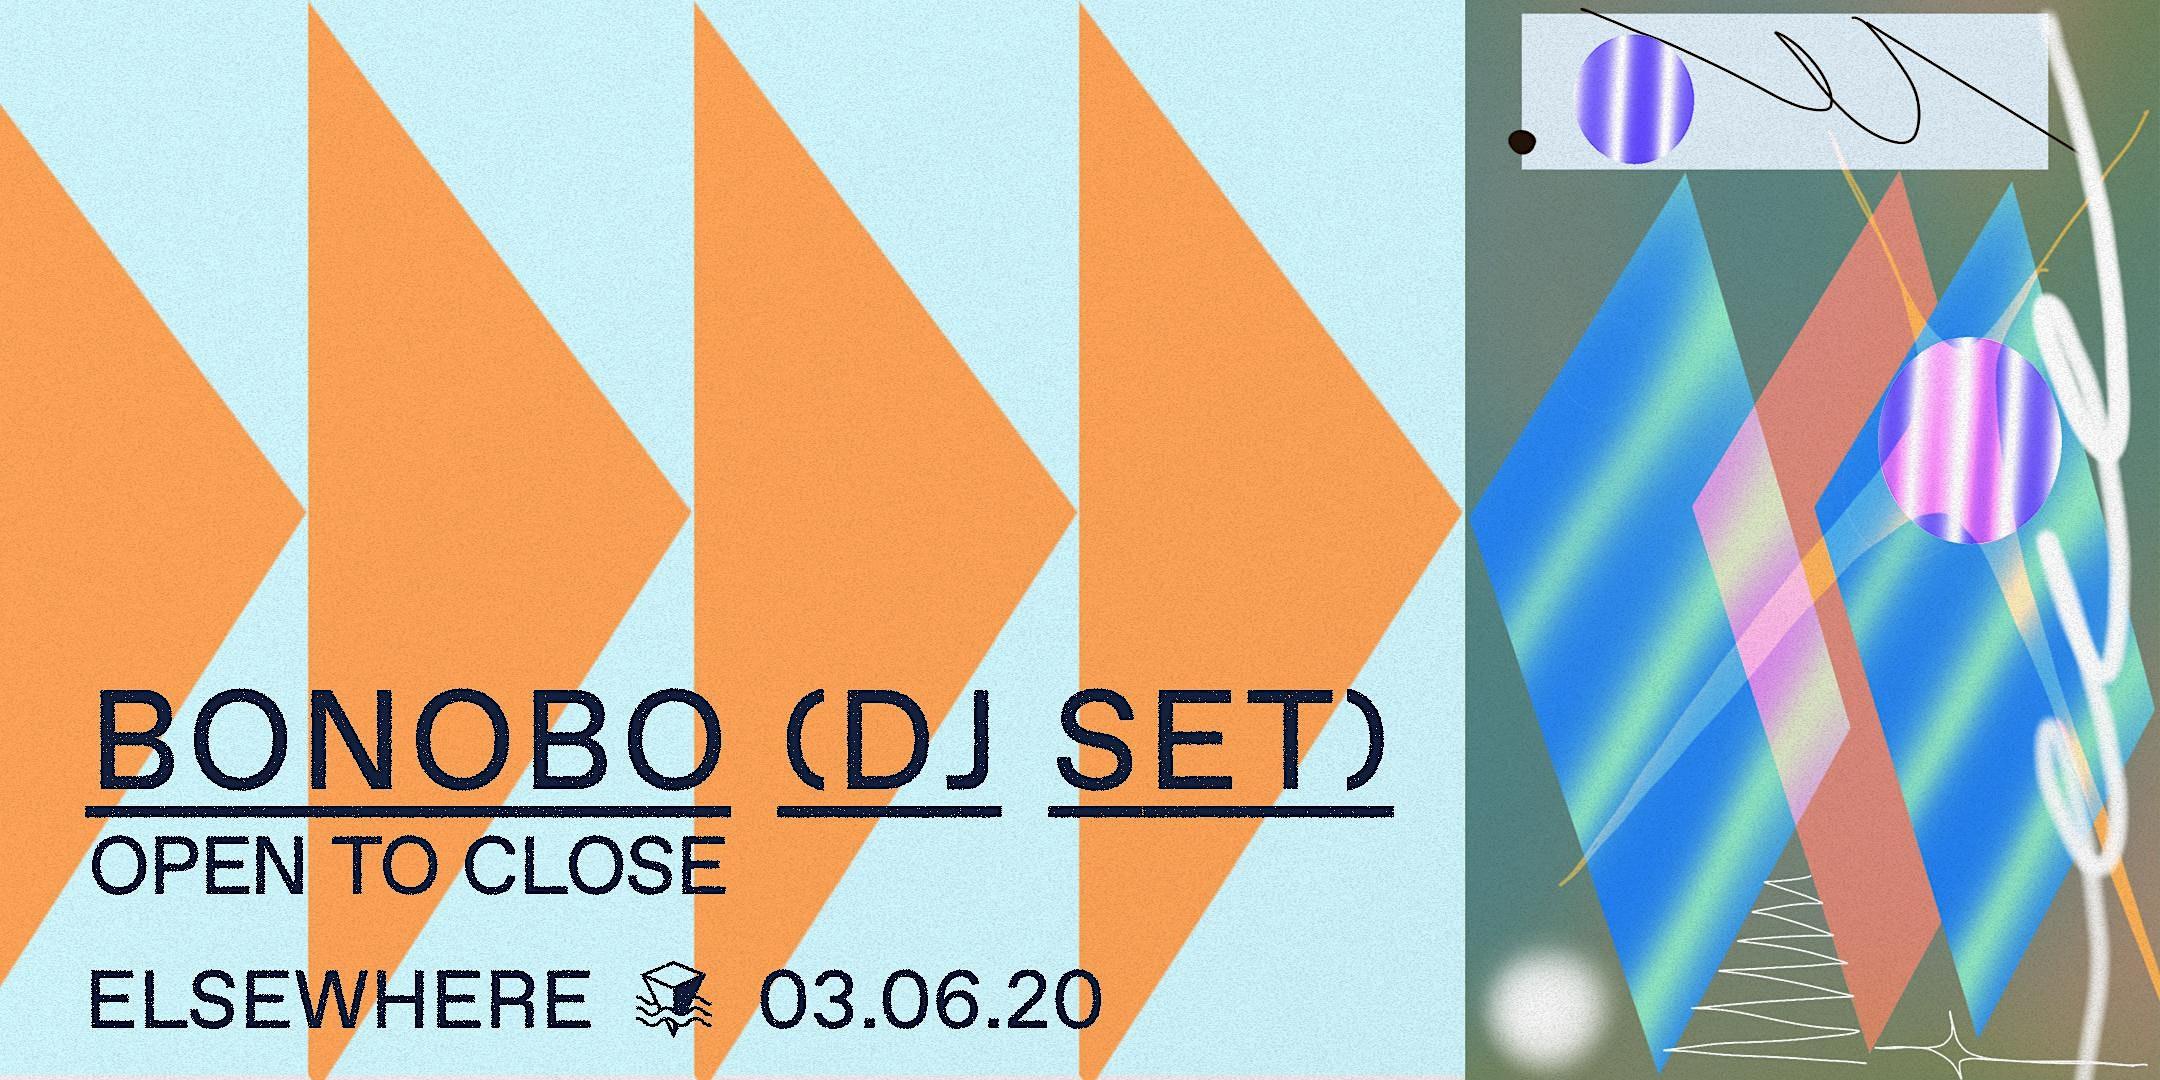 Bonobo (DJ Set) Open to Close